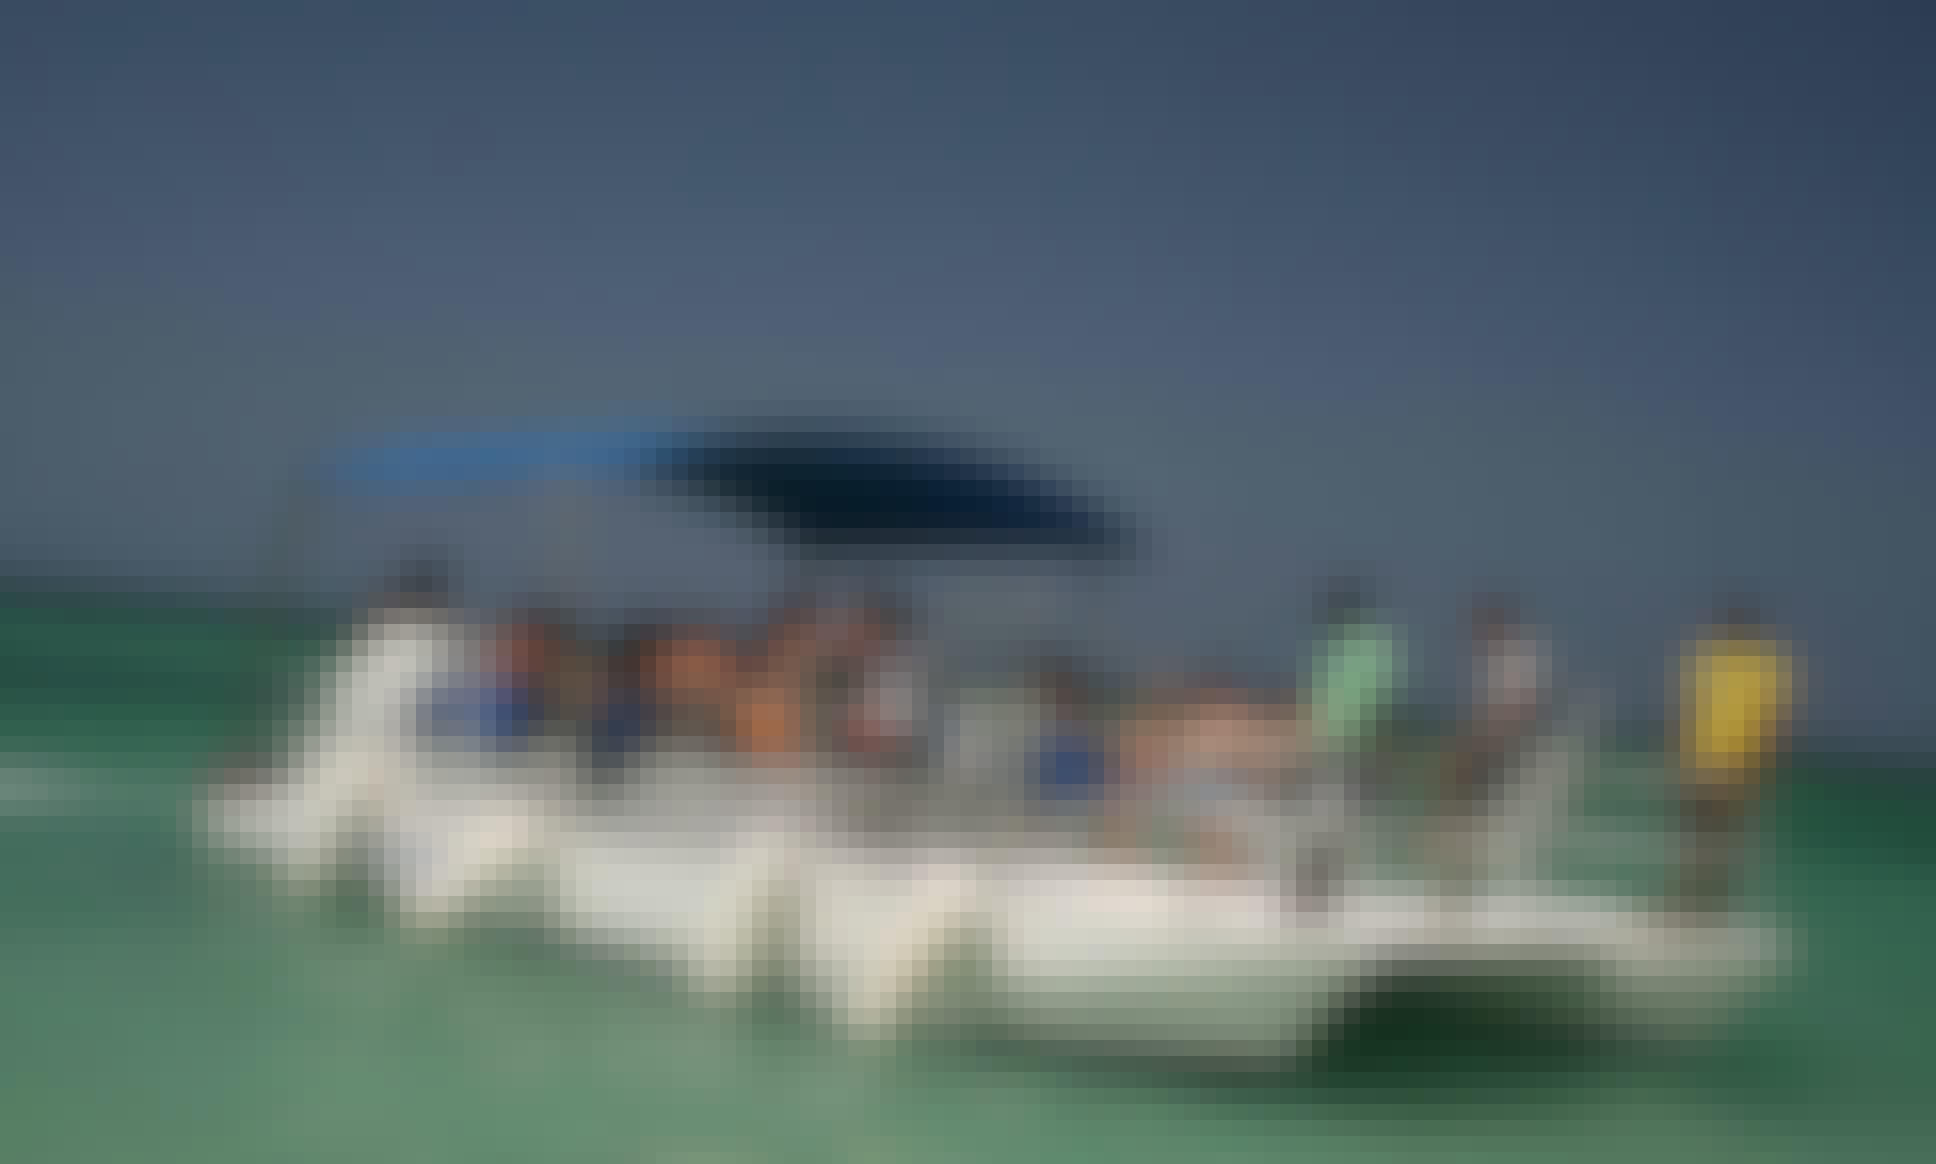 Explore Bavaro - Punta Cana, Dominican Republic with a Pontoon Catamaran Boat